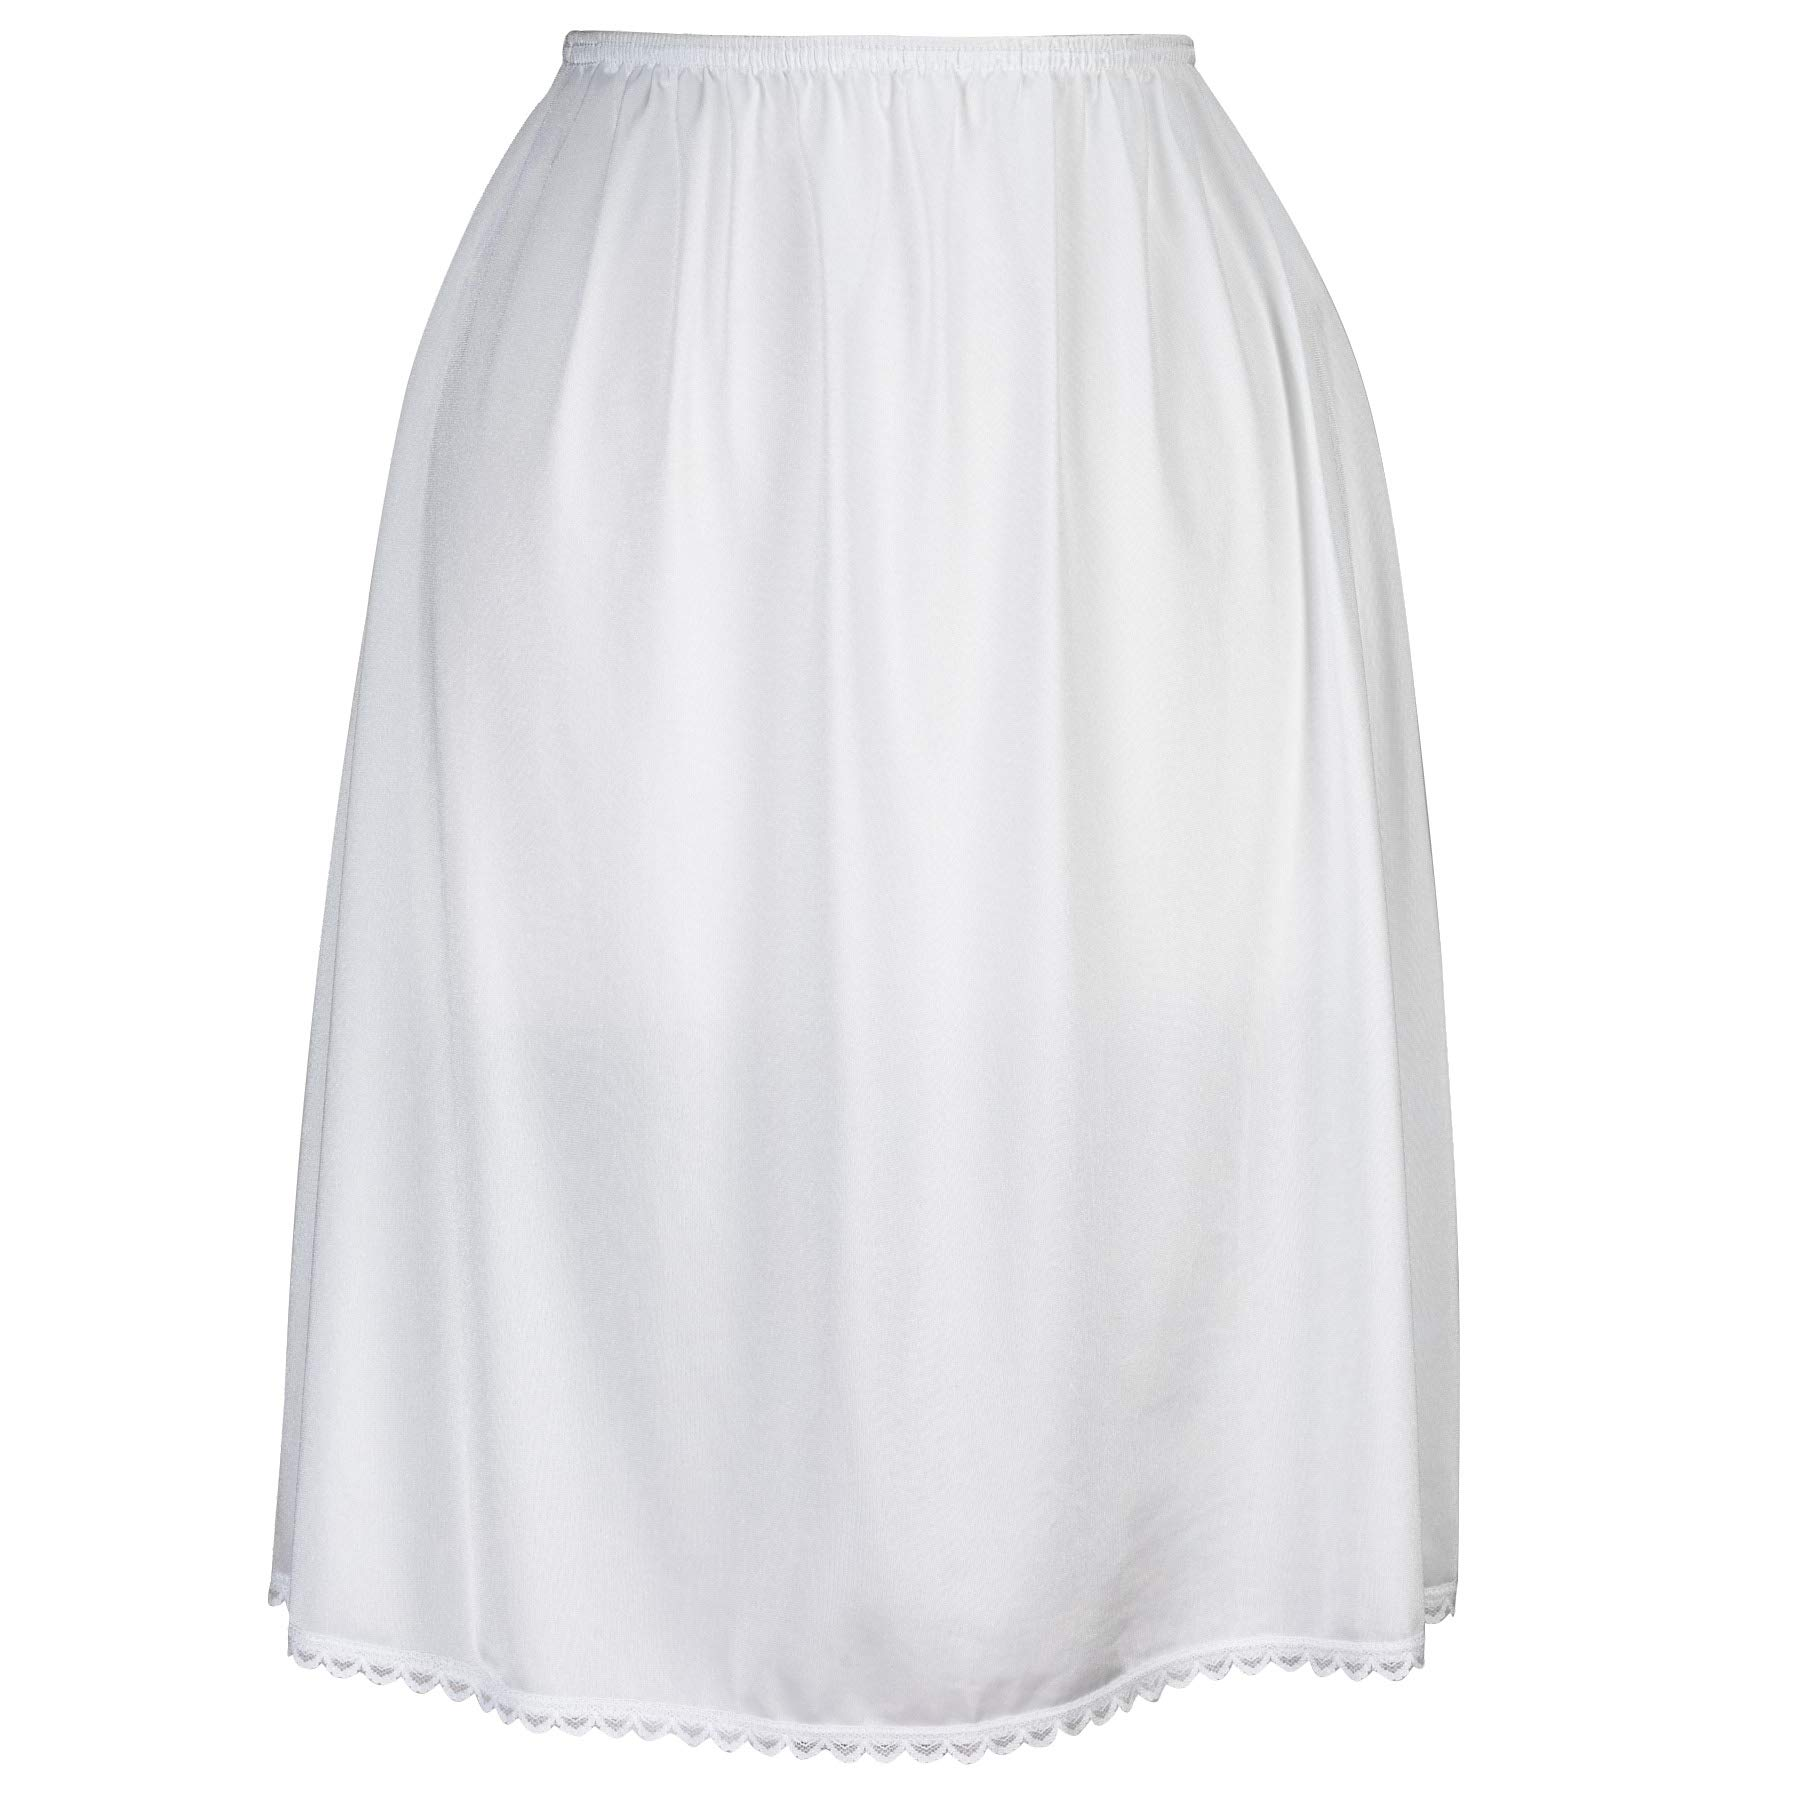 "Valair Classic Short and Long Half Slip Skirt for Ladies and Girls - Slight Flair - Anti Static - Ranges 14"" Till 34"" Lengths"